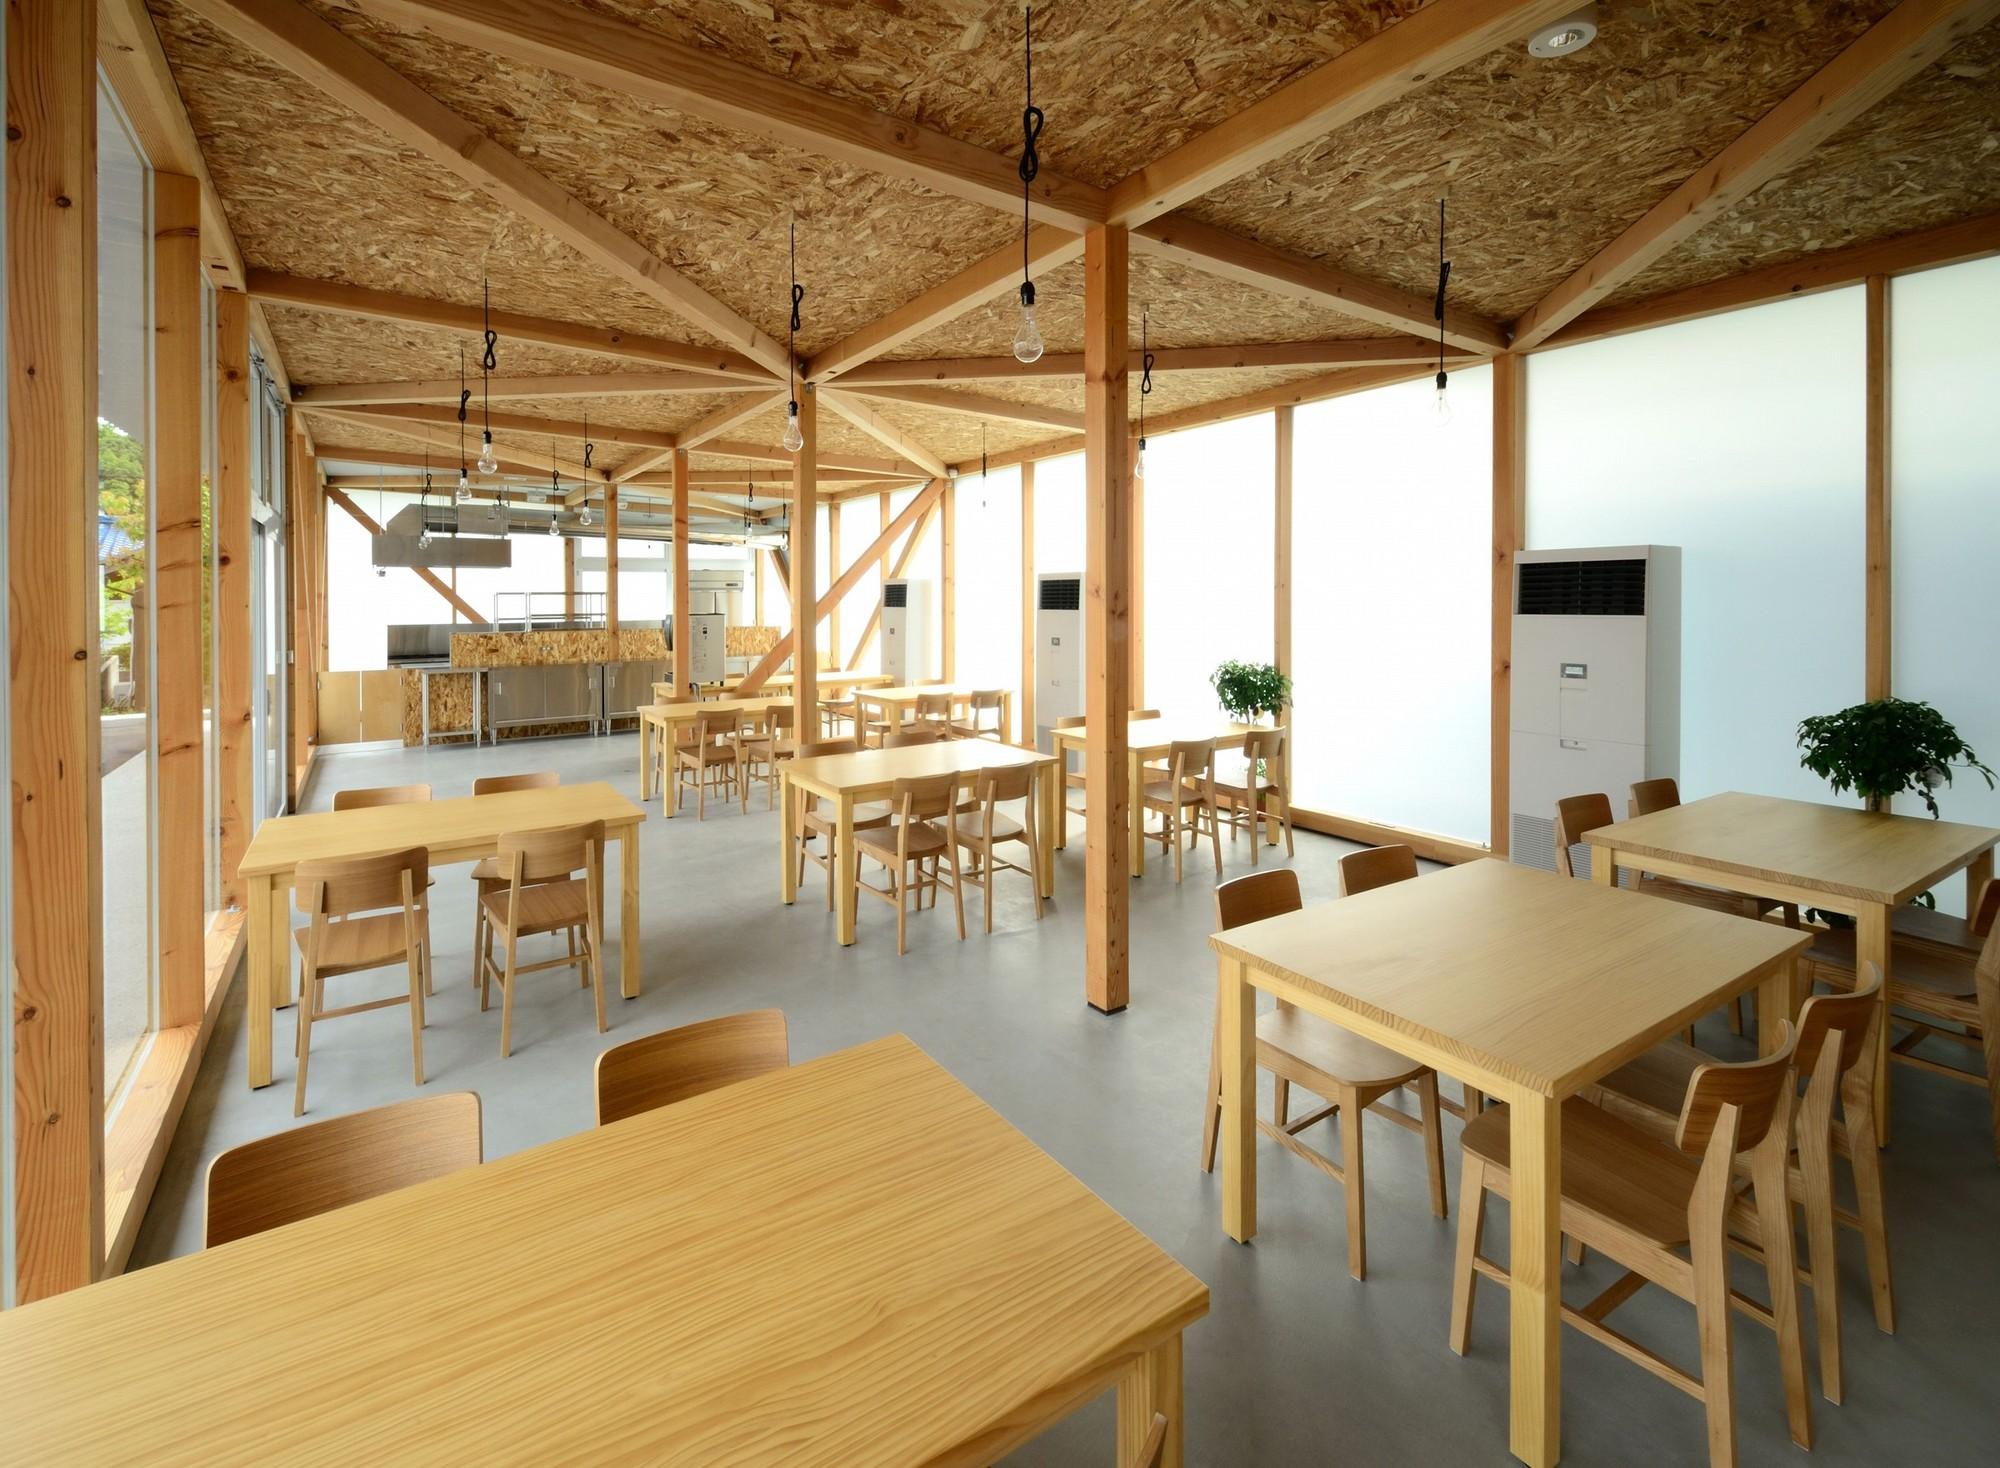 Cafeteria in Ushimado / Niji Architects, © Masafumi Harada/Niji Photo